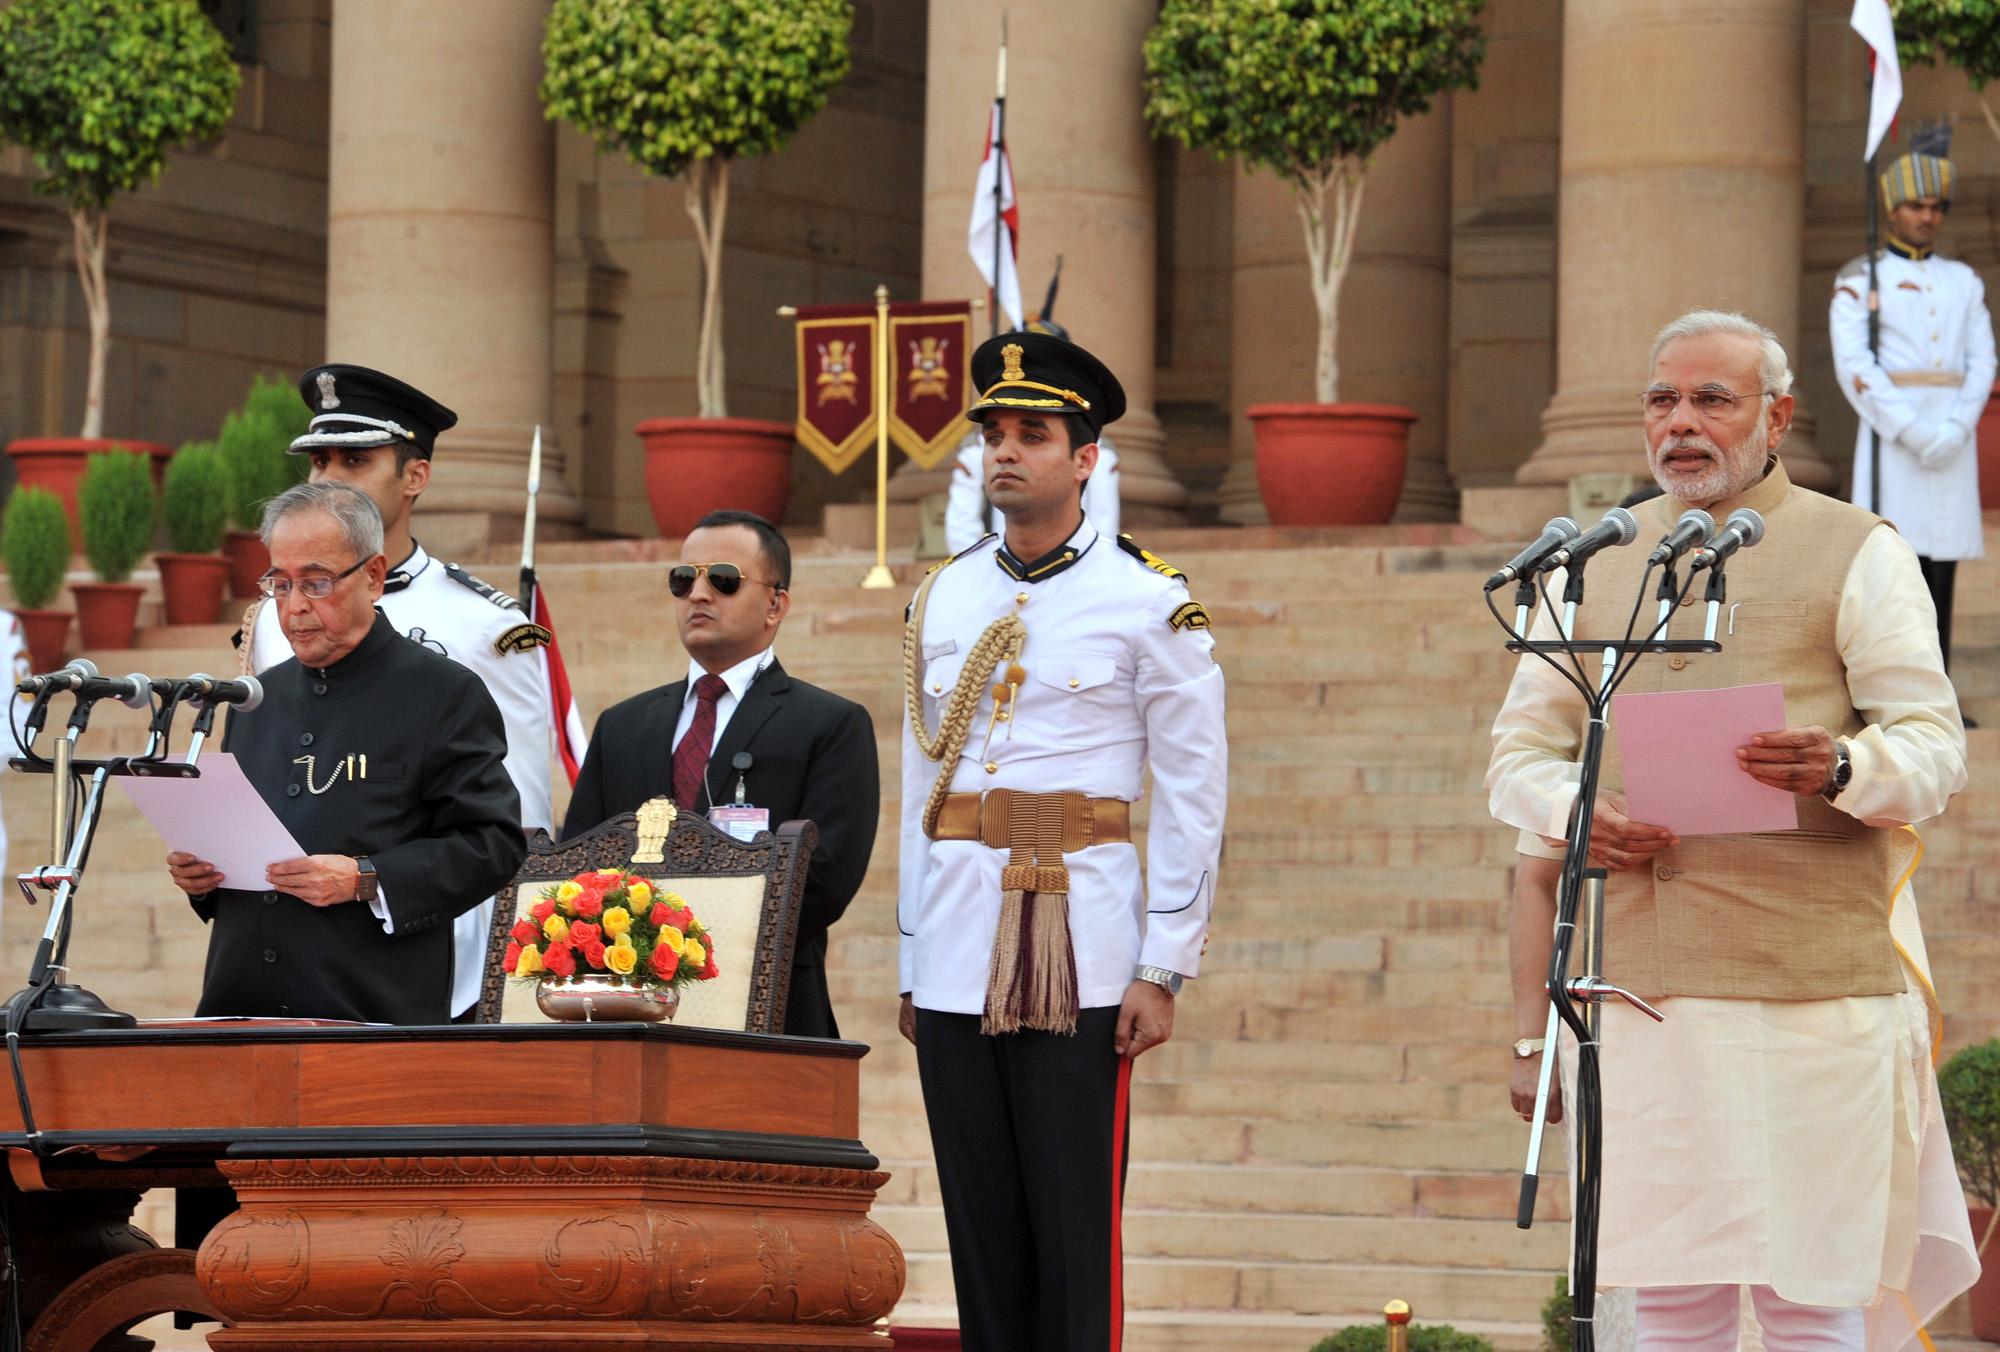 First swearing-in ceremony of Narendra Modi - Wikipedia